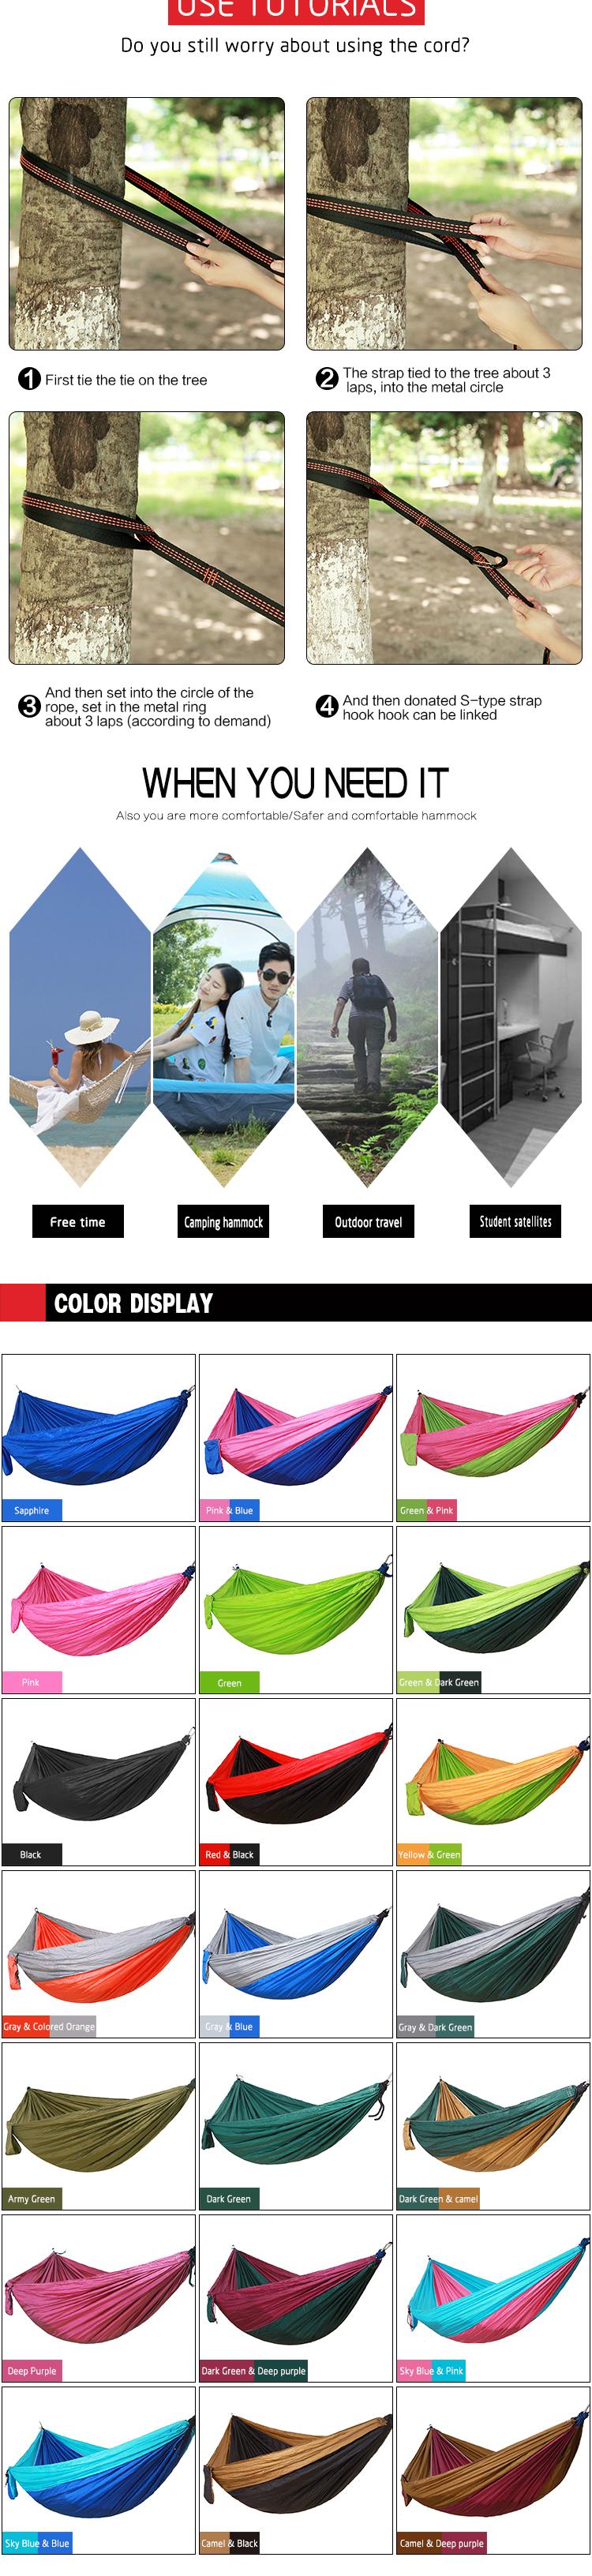 Double person Hammock Portable Parachute Nylon Fabric Travel Ultralight Camping hamak Outdoor Furniture casual hanging bed hamma 6